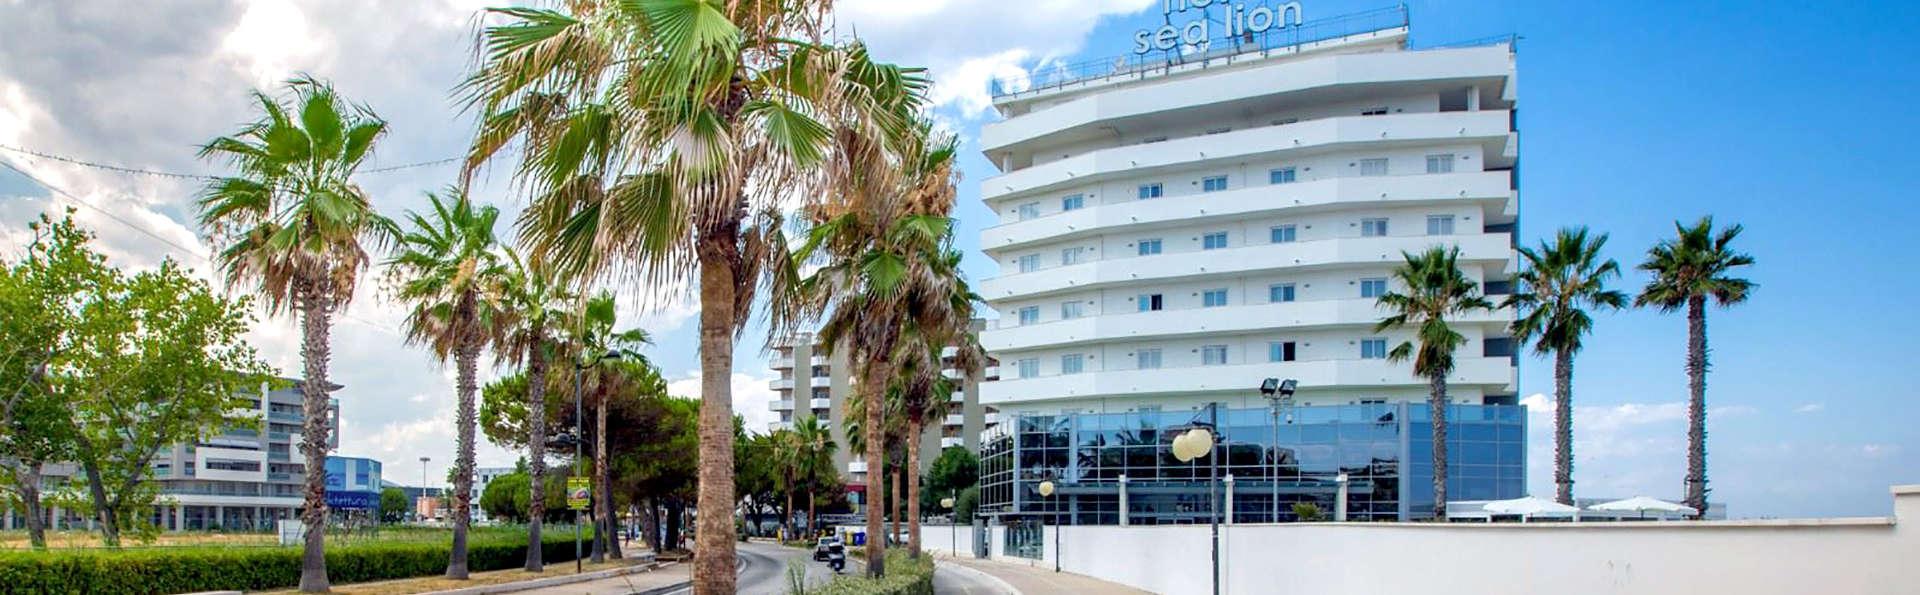 Sea Lion Hotel - Edit_Front2.jpg